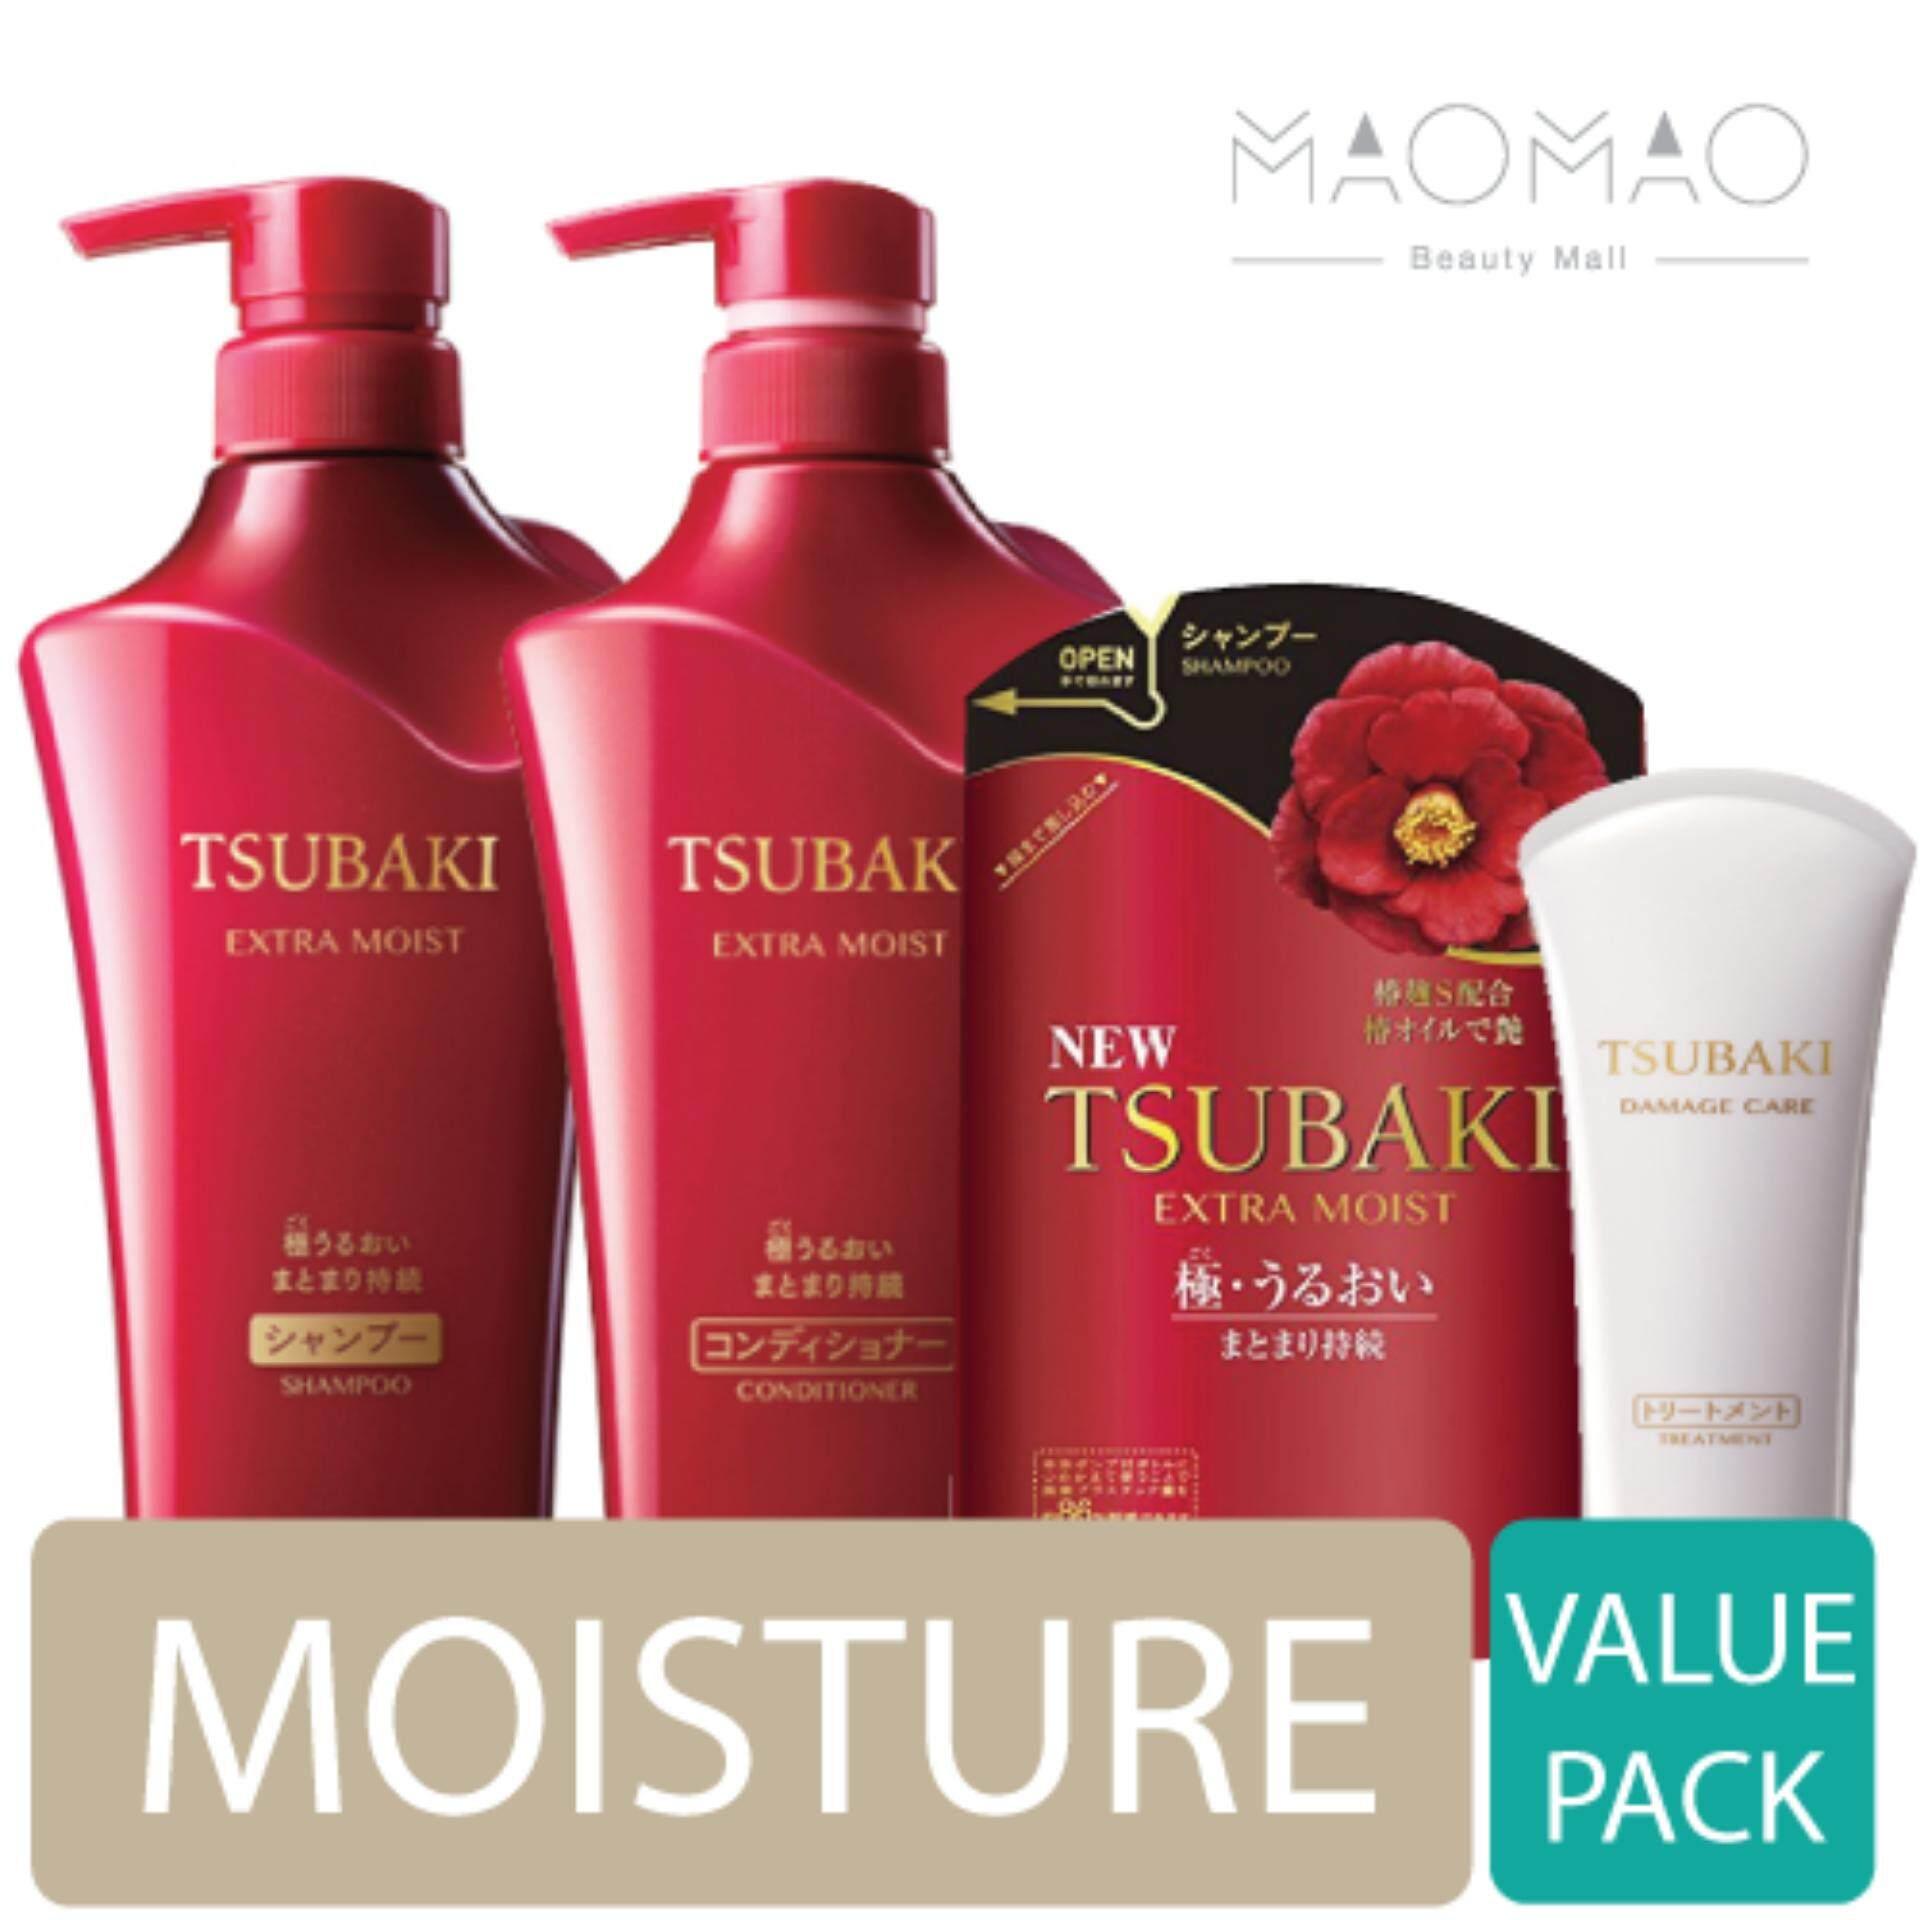 Cek Harga Shiseido Senka Perfect Whip 120g Terbaru Malaysian Counterpain Tsubaki Extra Moisture Shampoo 500ml Conditioner Refill Pack 345ml Treatment